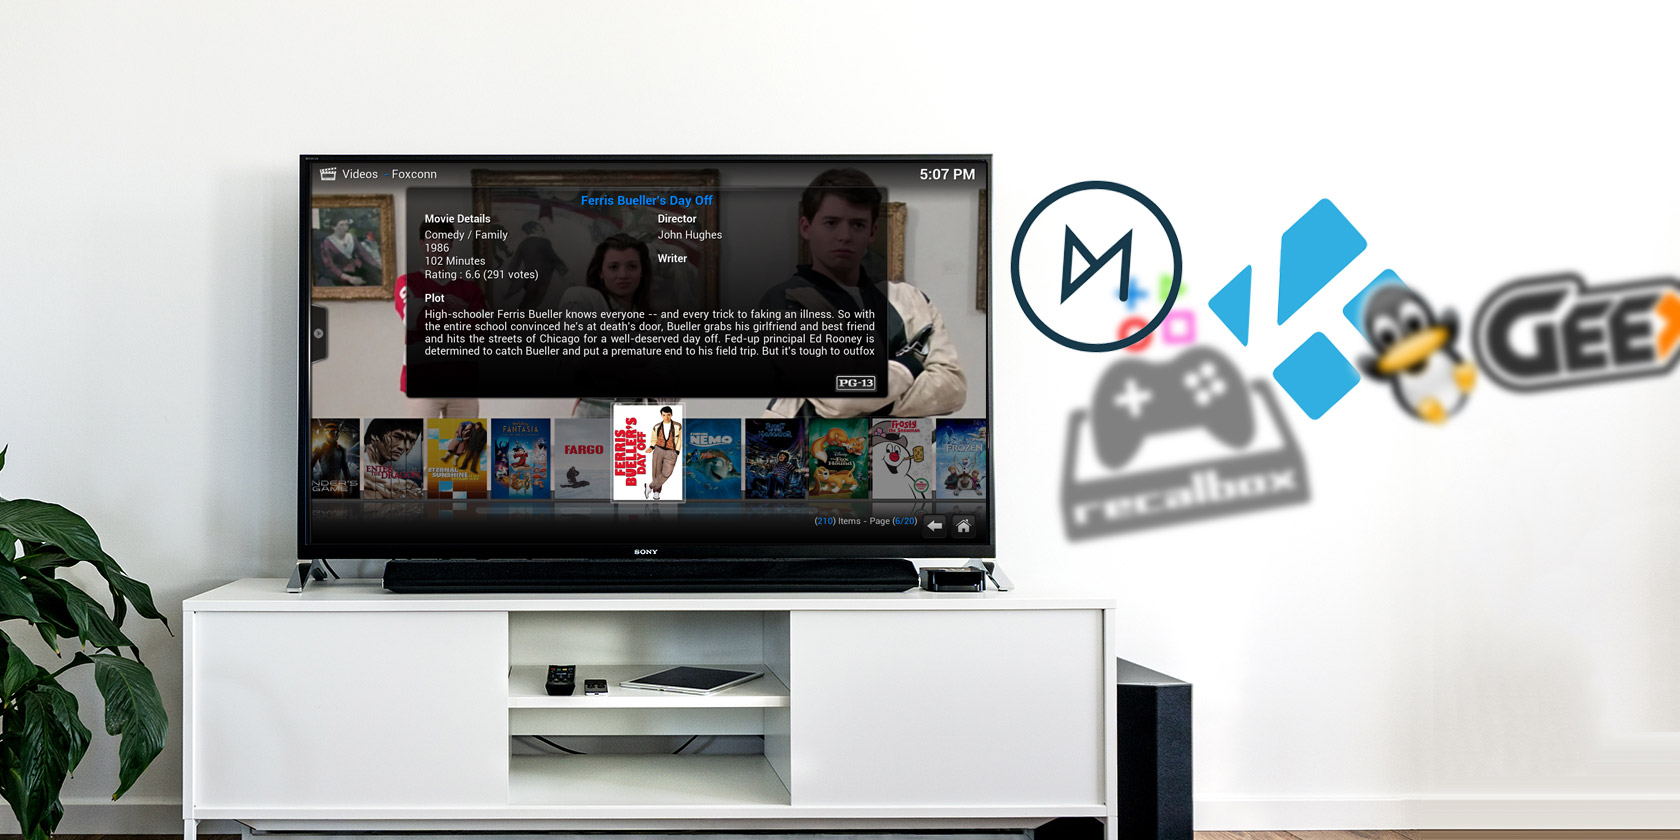 linux-media-center-distros